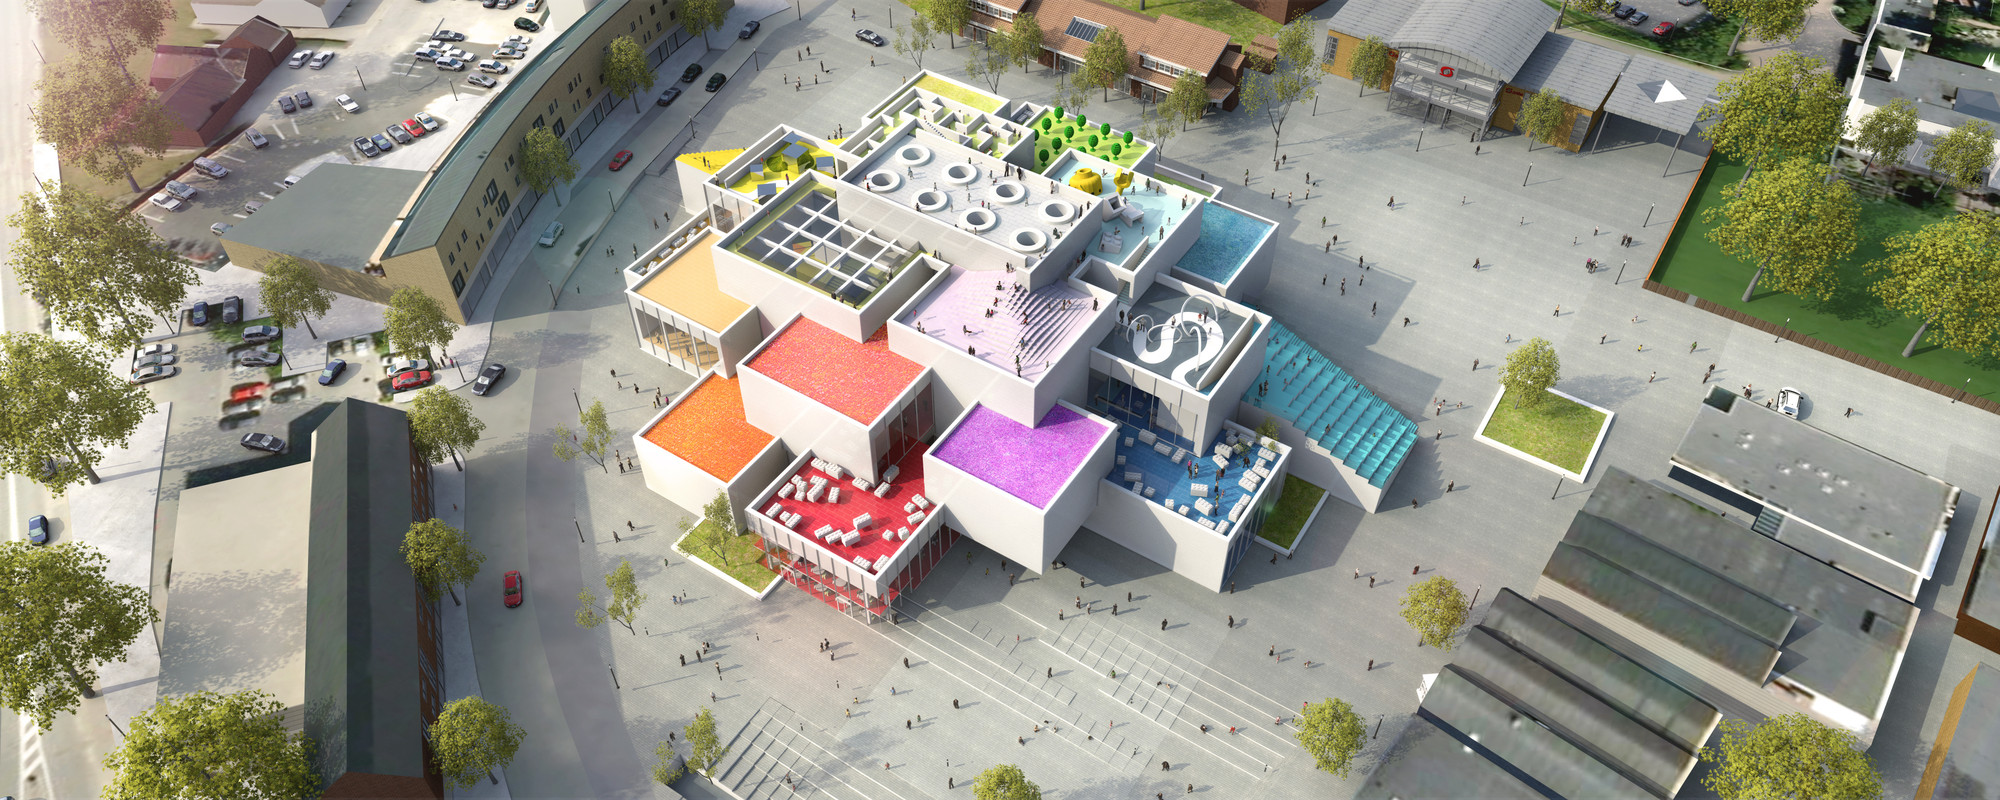 Bjarke Ingels Lays Foundation Brick at LEGO House